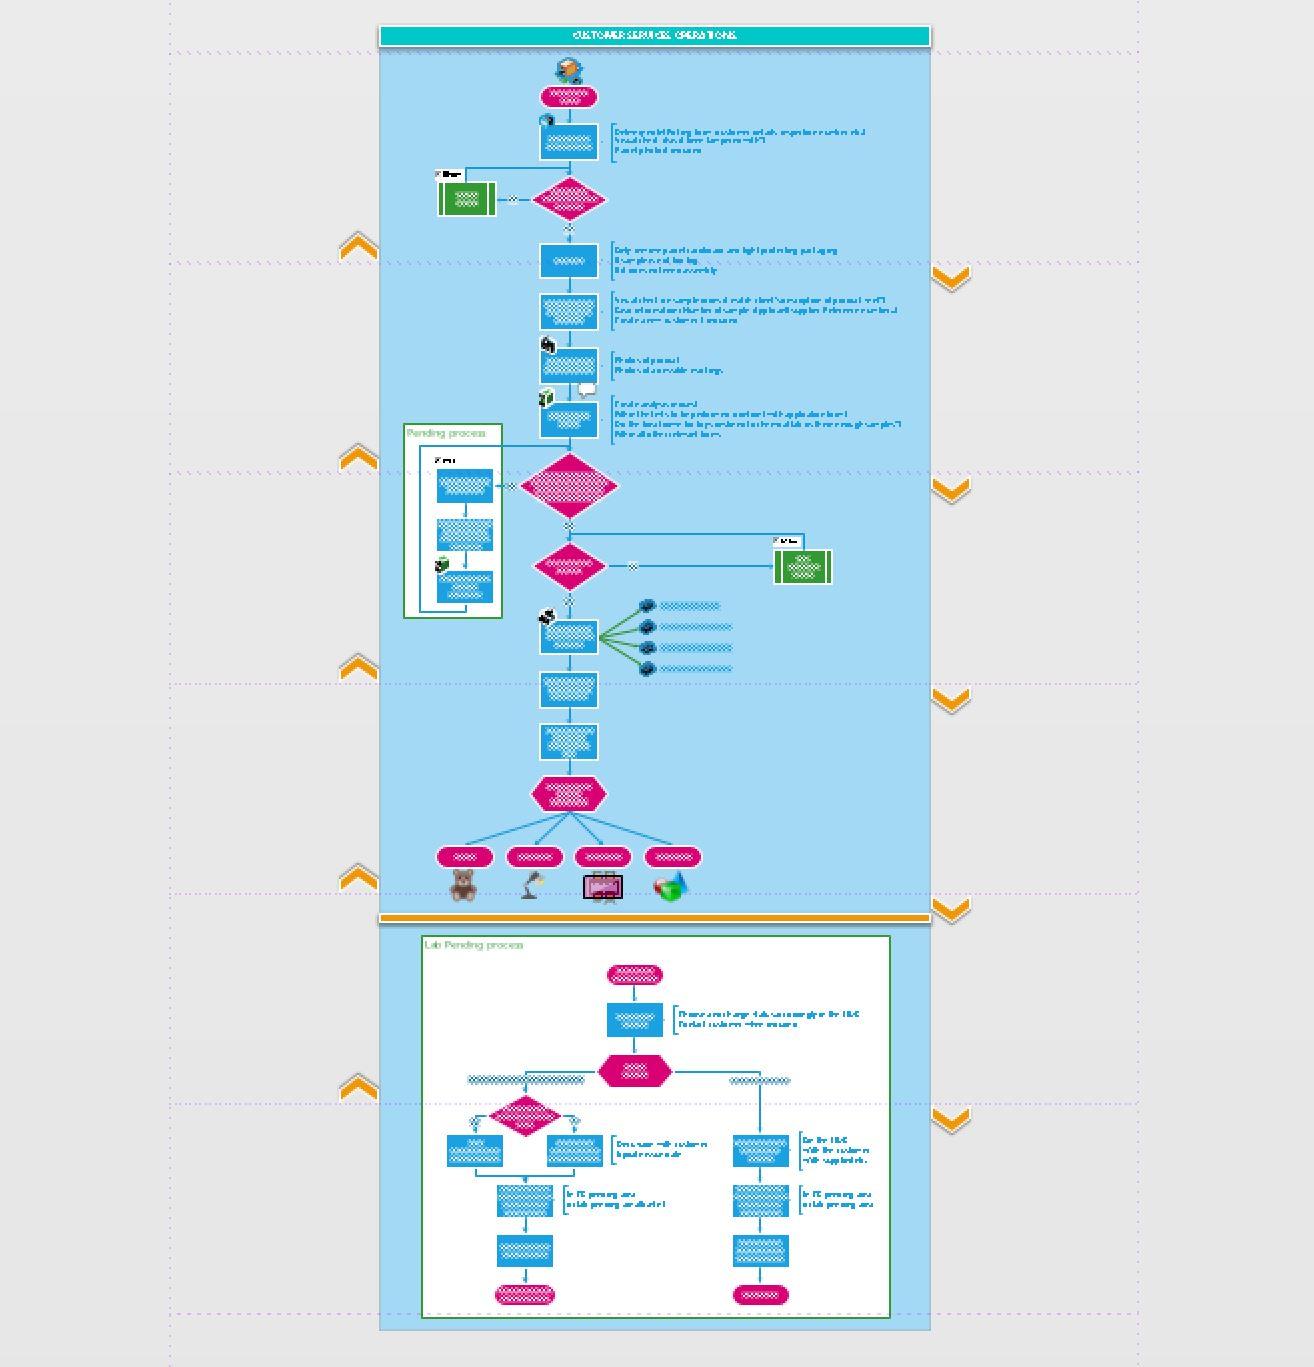 Exporting, saving, printing Visio file to PDF returns wrong page ...